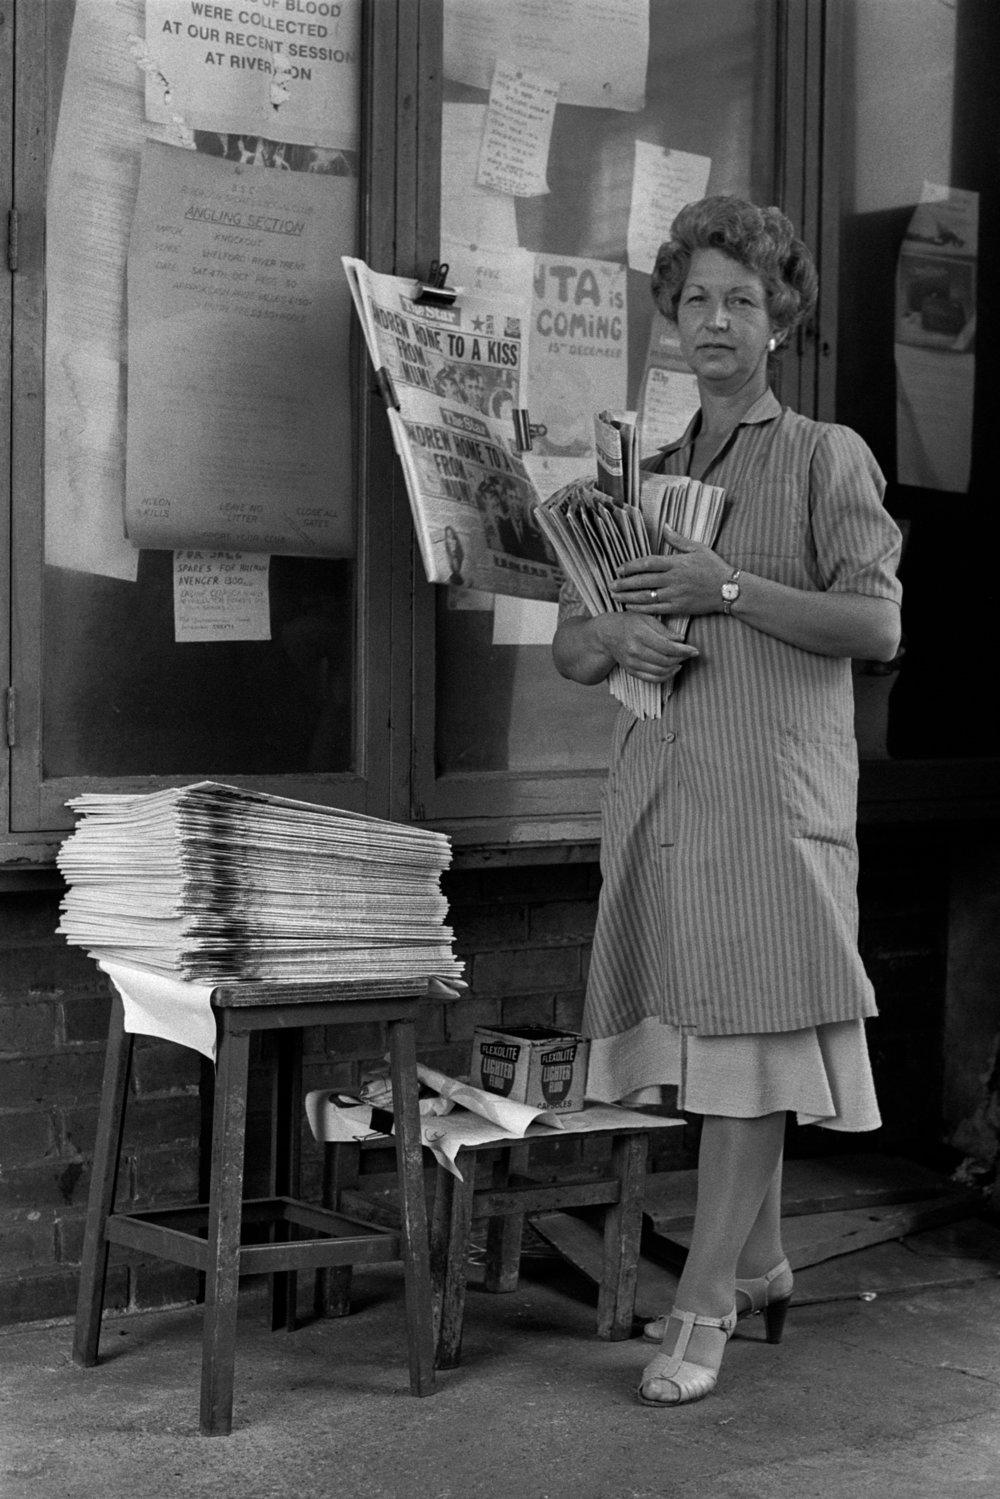 Von, the Sheffield Star newspaper seller, at BSC River Don works, Sheffield. (Martin Jenkinson, 1982)